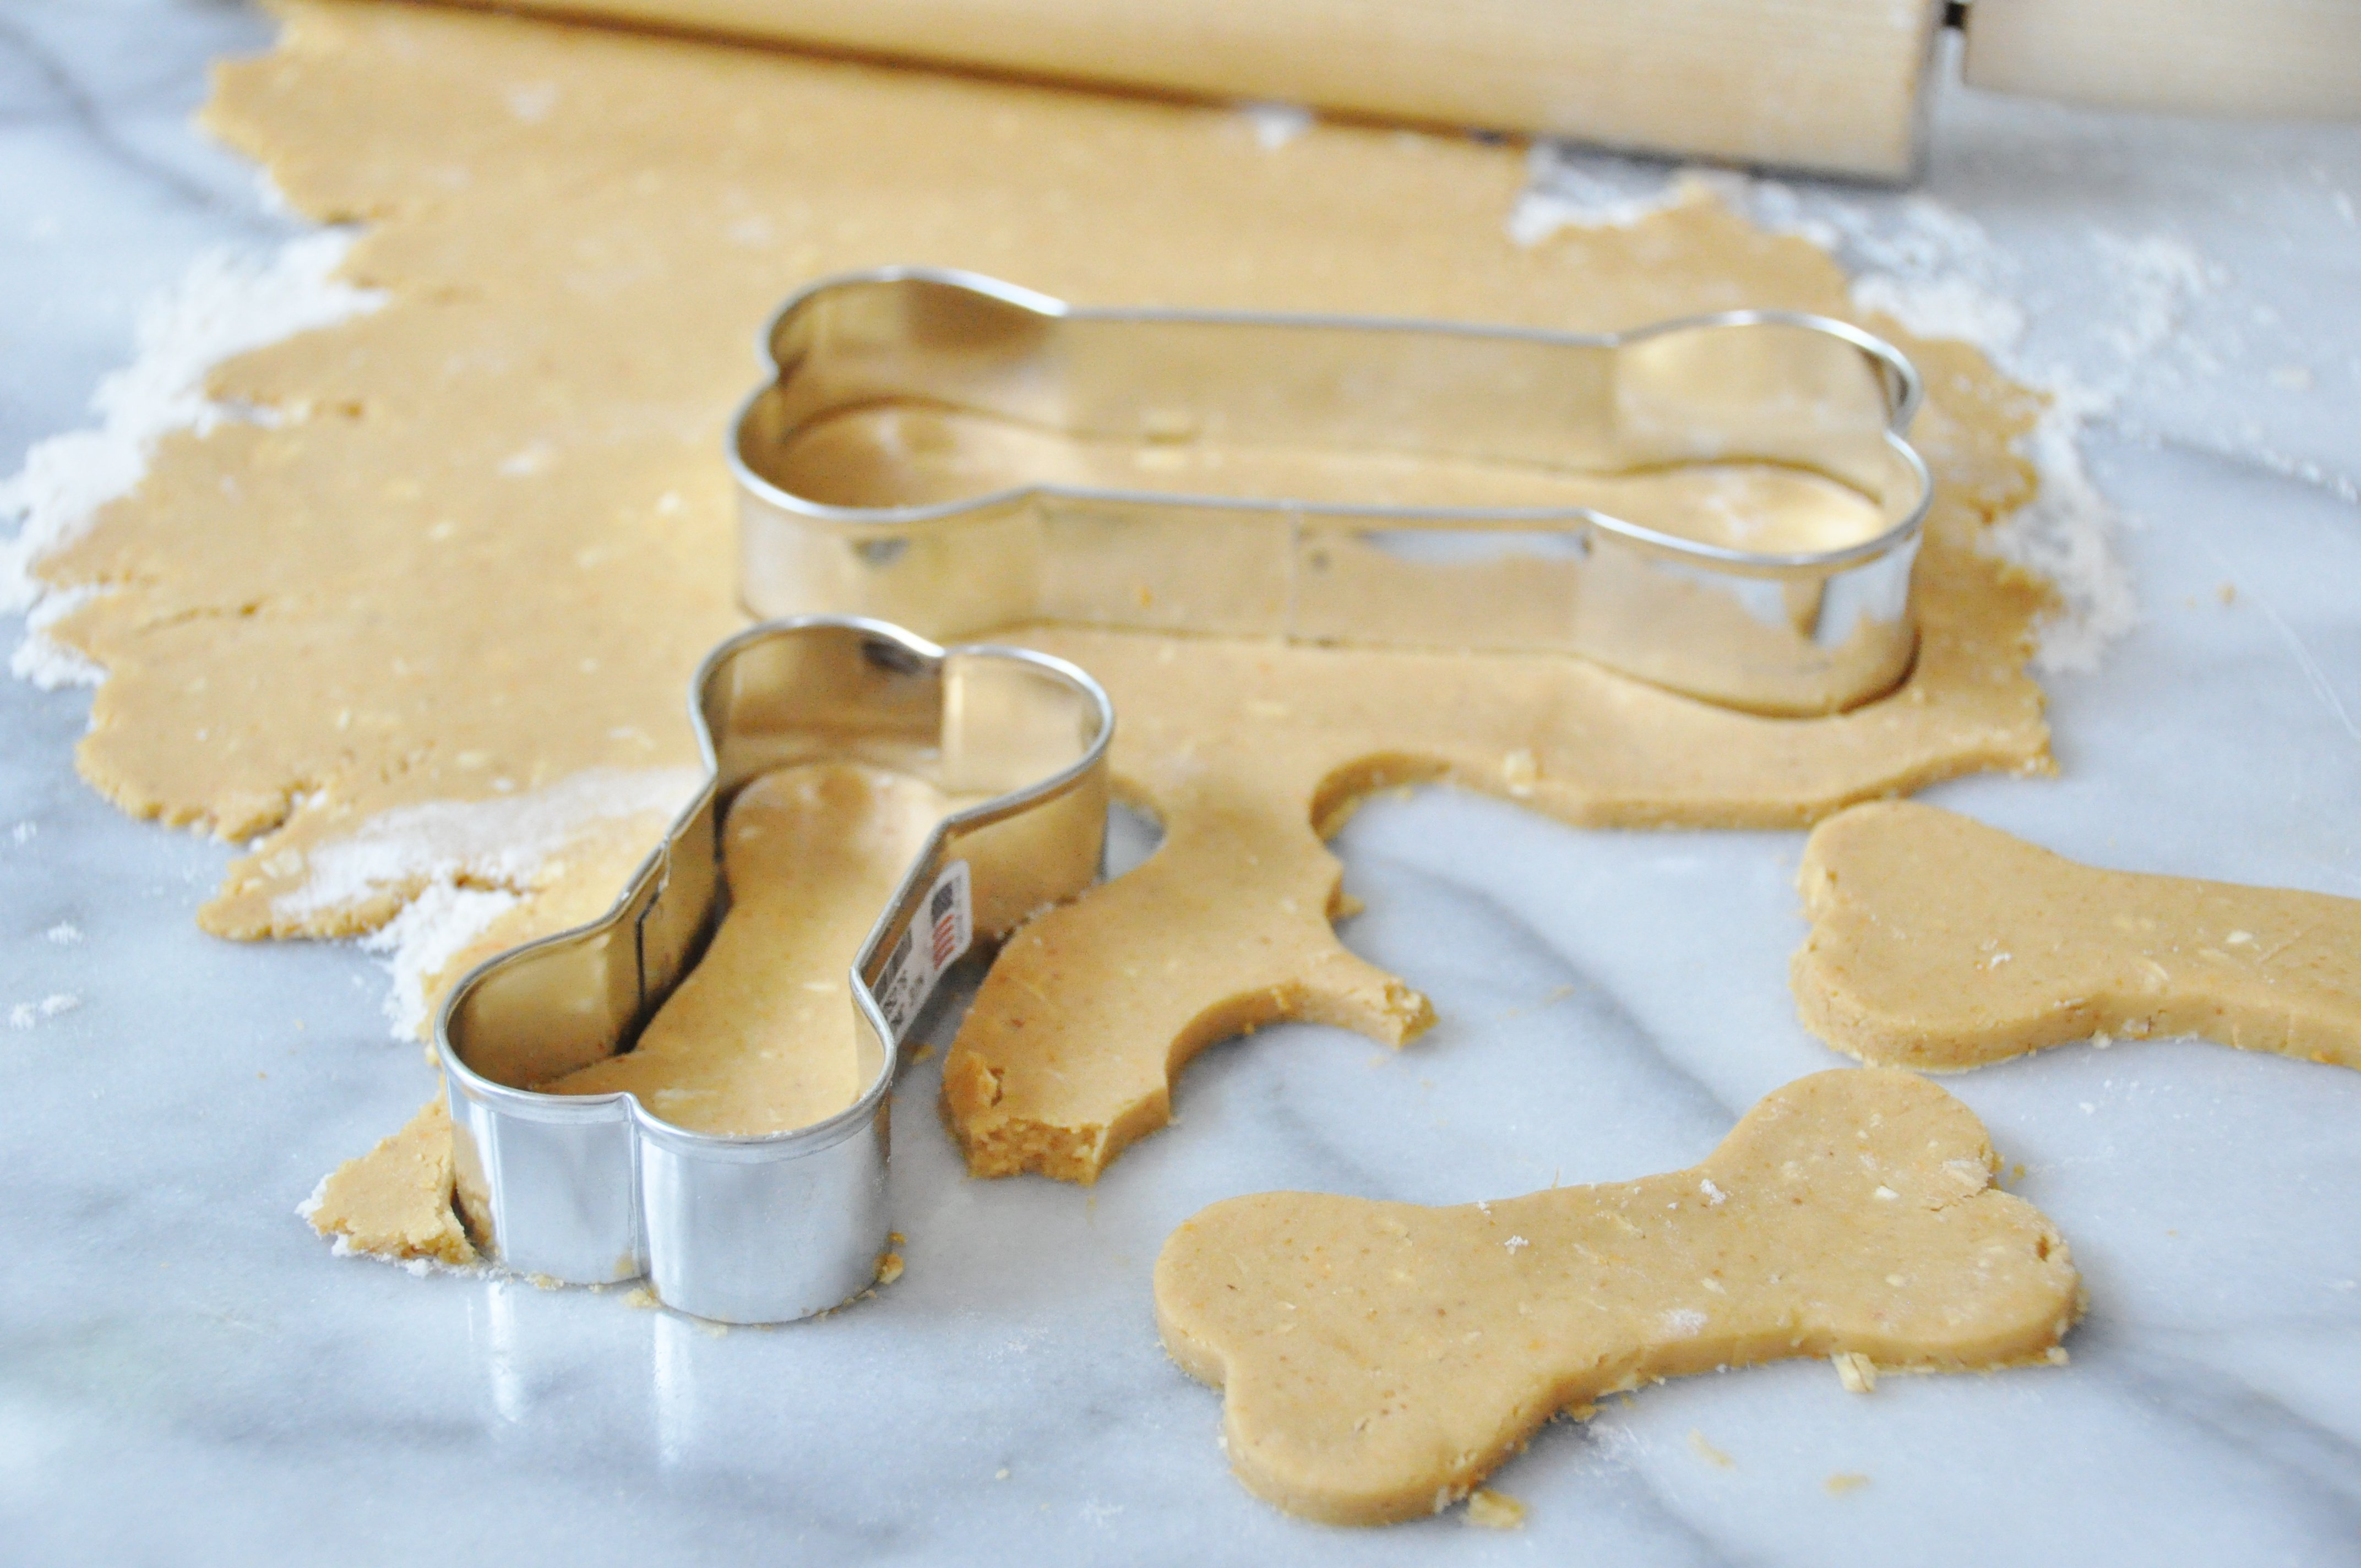 Vegan Peanut Butter and Carrot Dog Cookies